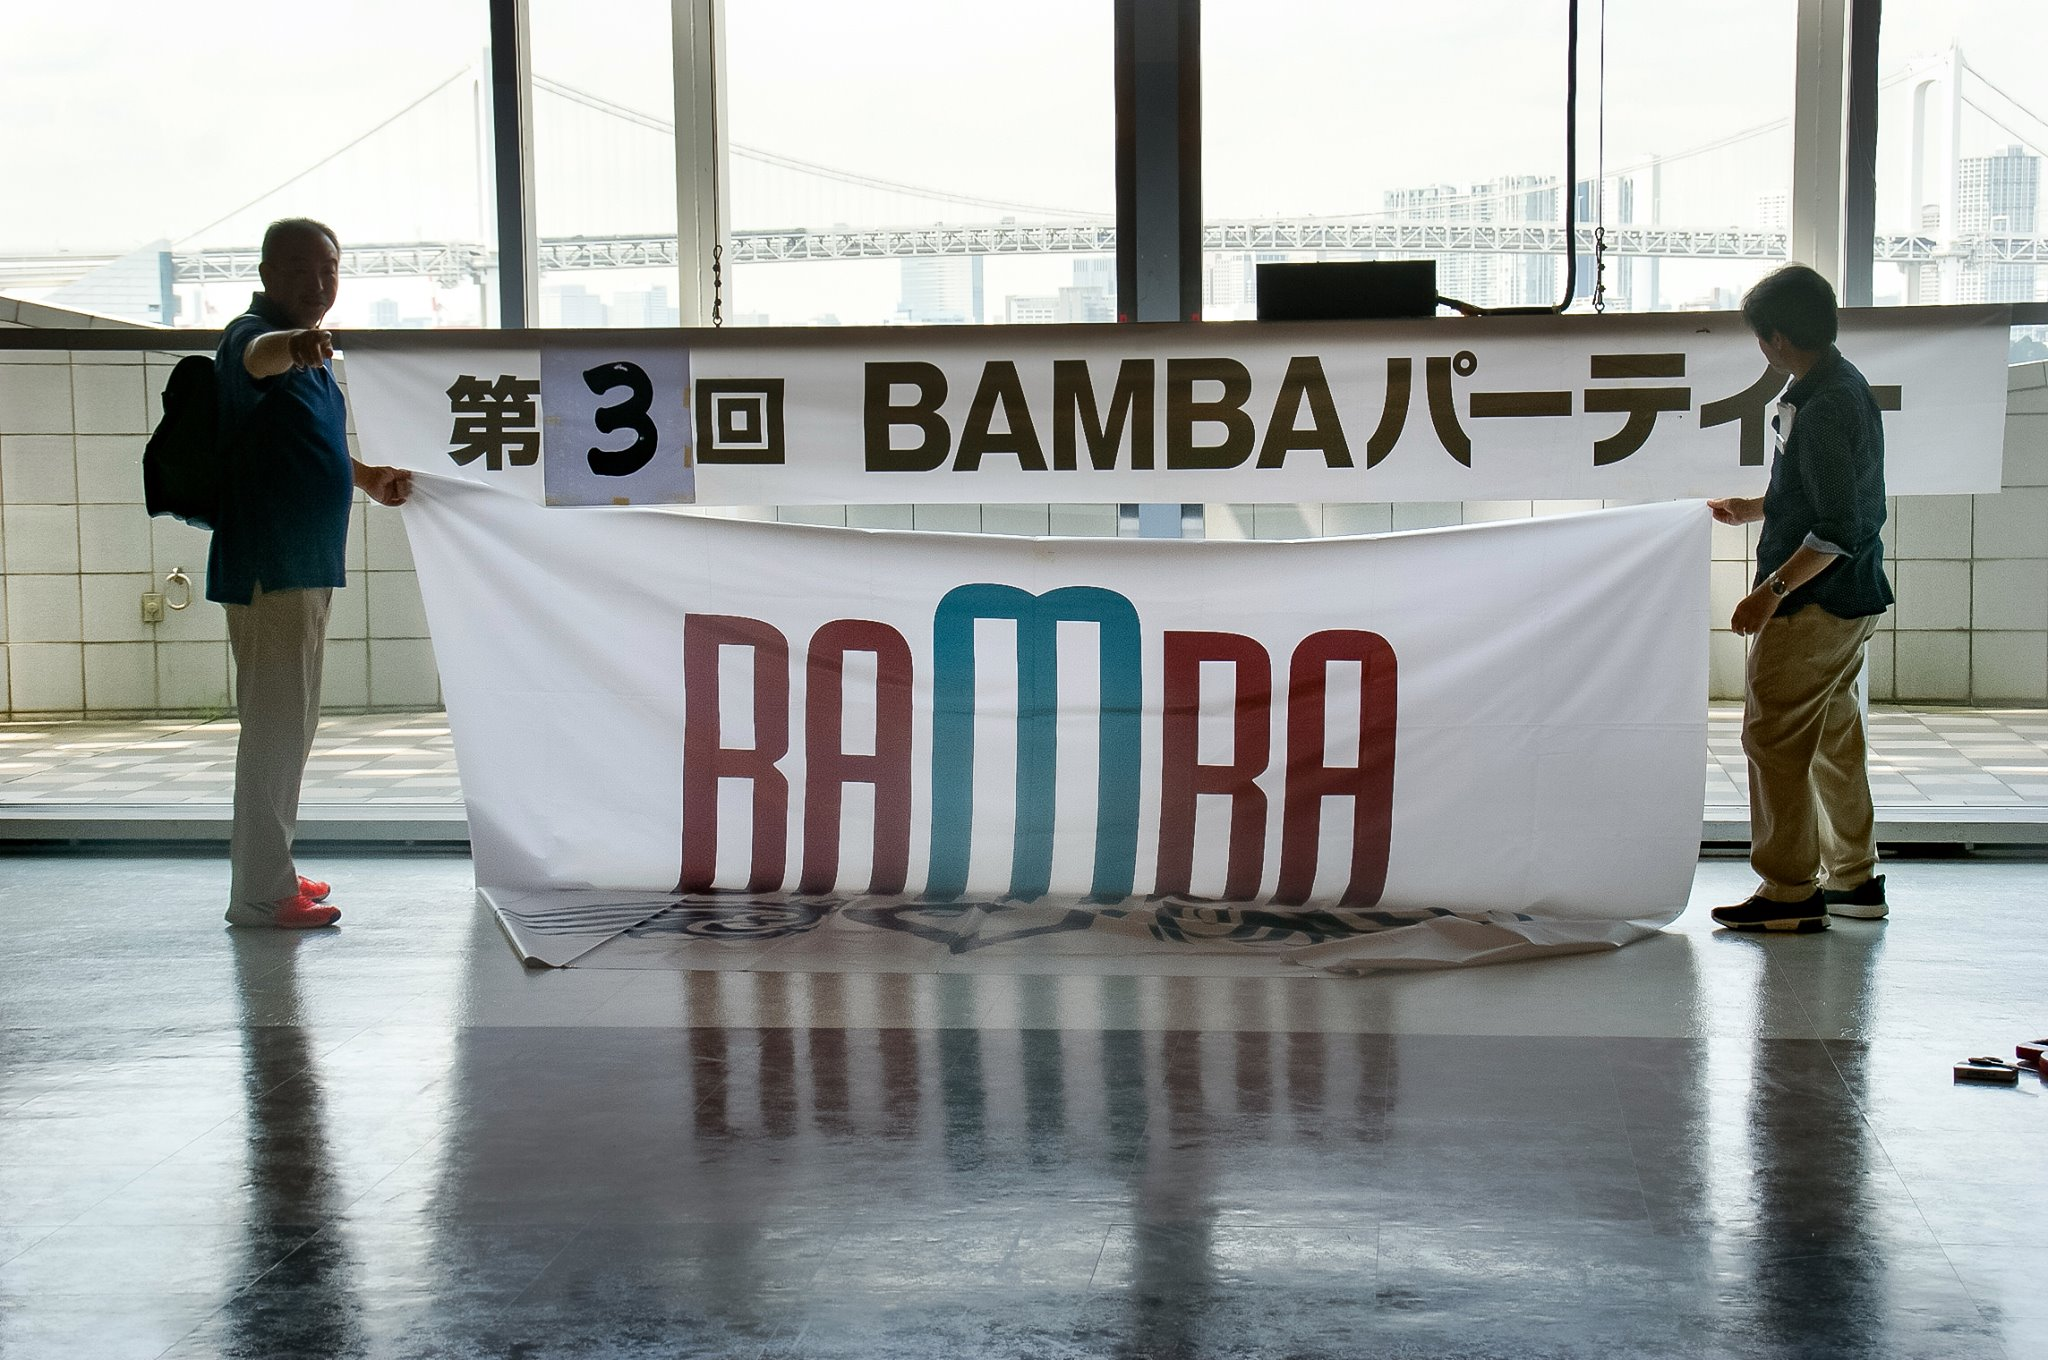 BAMBAフラッグ